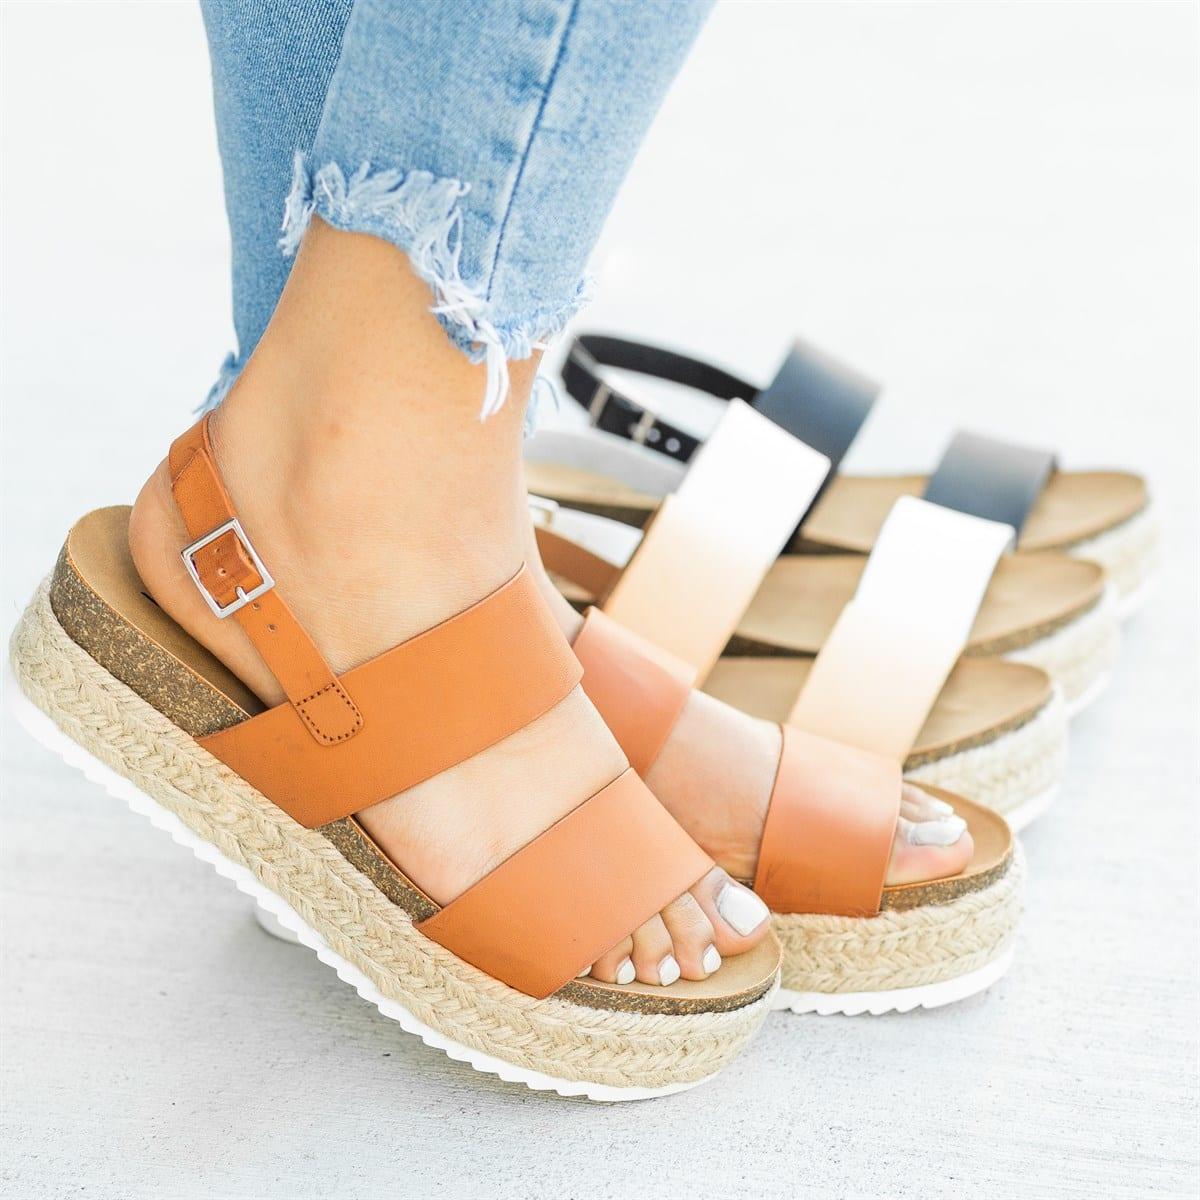 Adisputent Sandal Summer Strap Ladies Shoes Plateform Wedges Women High-Heels Comfort